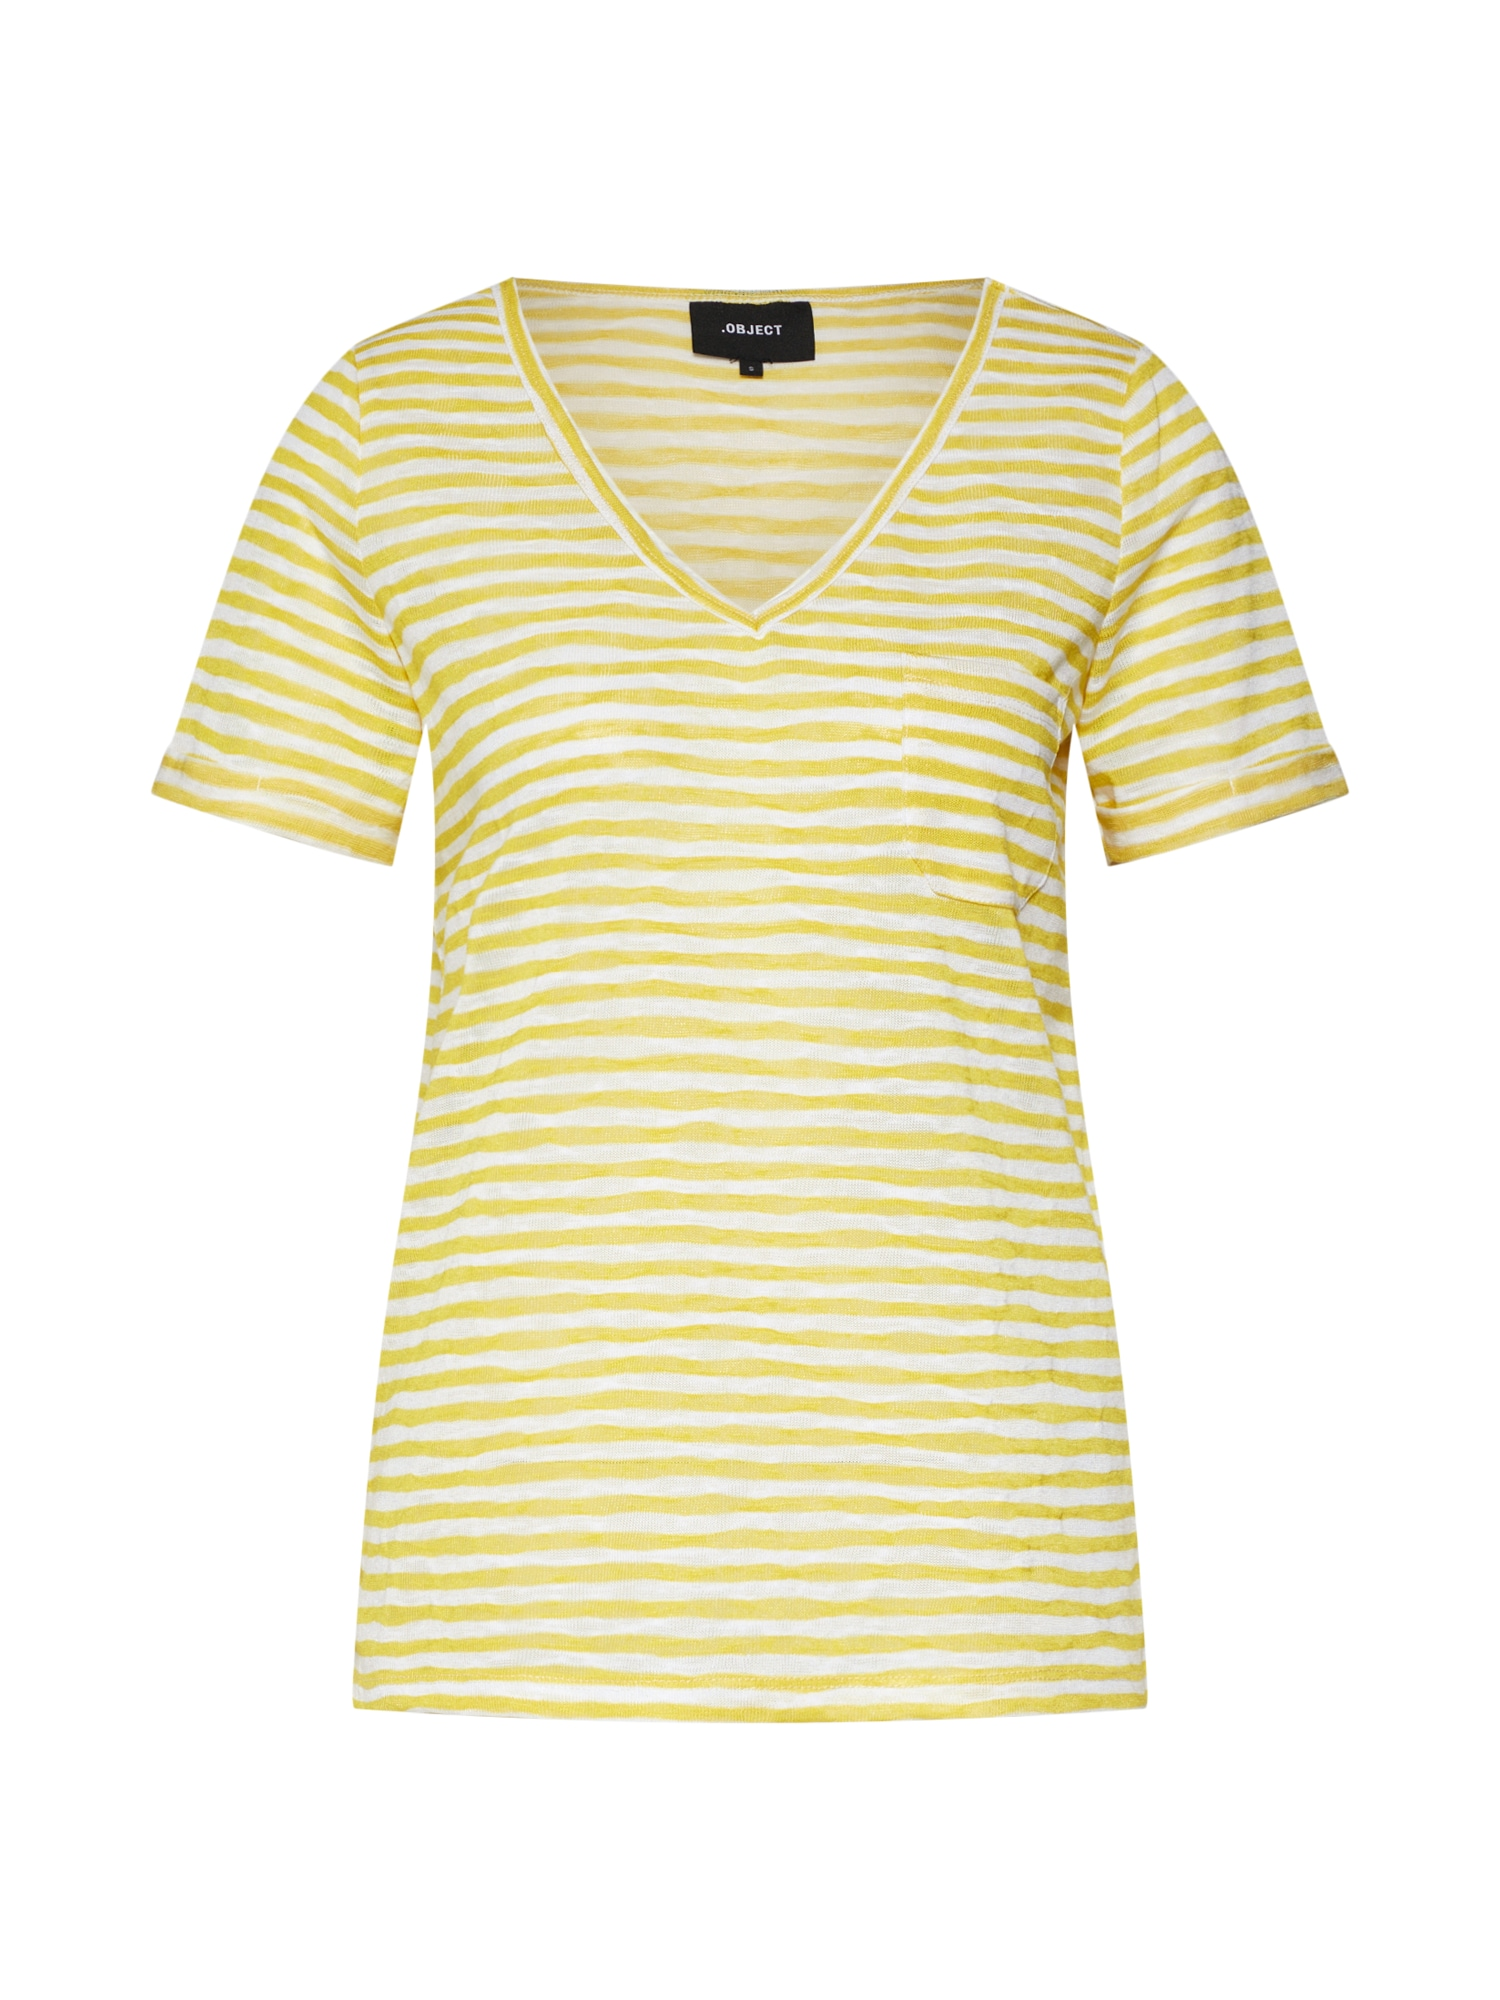 Tričko OBJTESSI žlutá bílá OBJECT